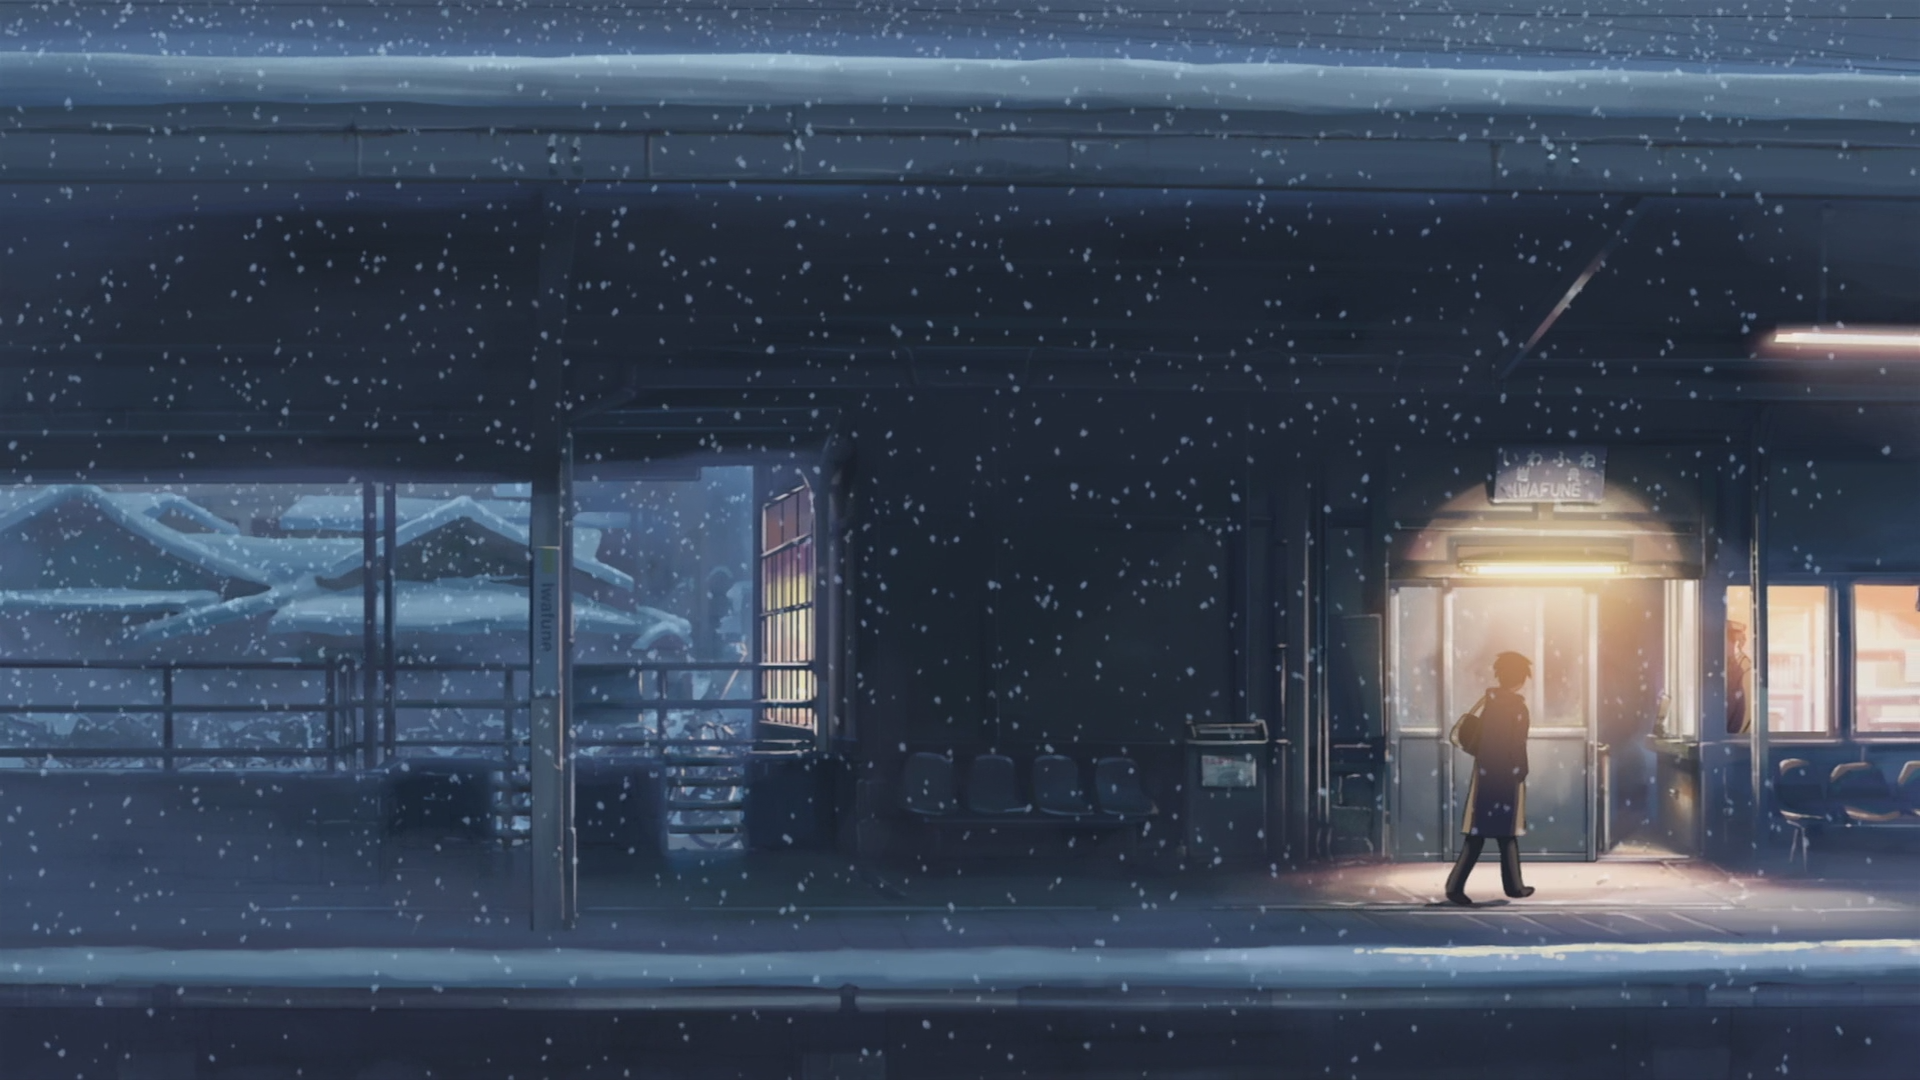 #snow, #5 Centimeters Per Second, #train Station, #makoto - 5 Centimeters Per Second Snow , HD Wallpaper & Backgrounds